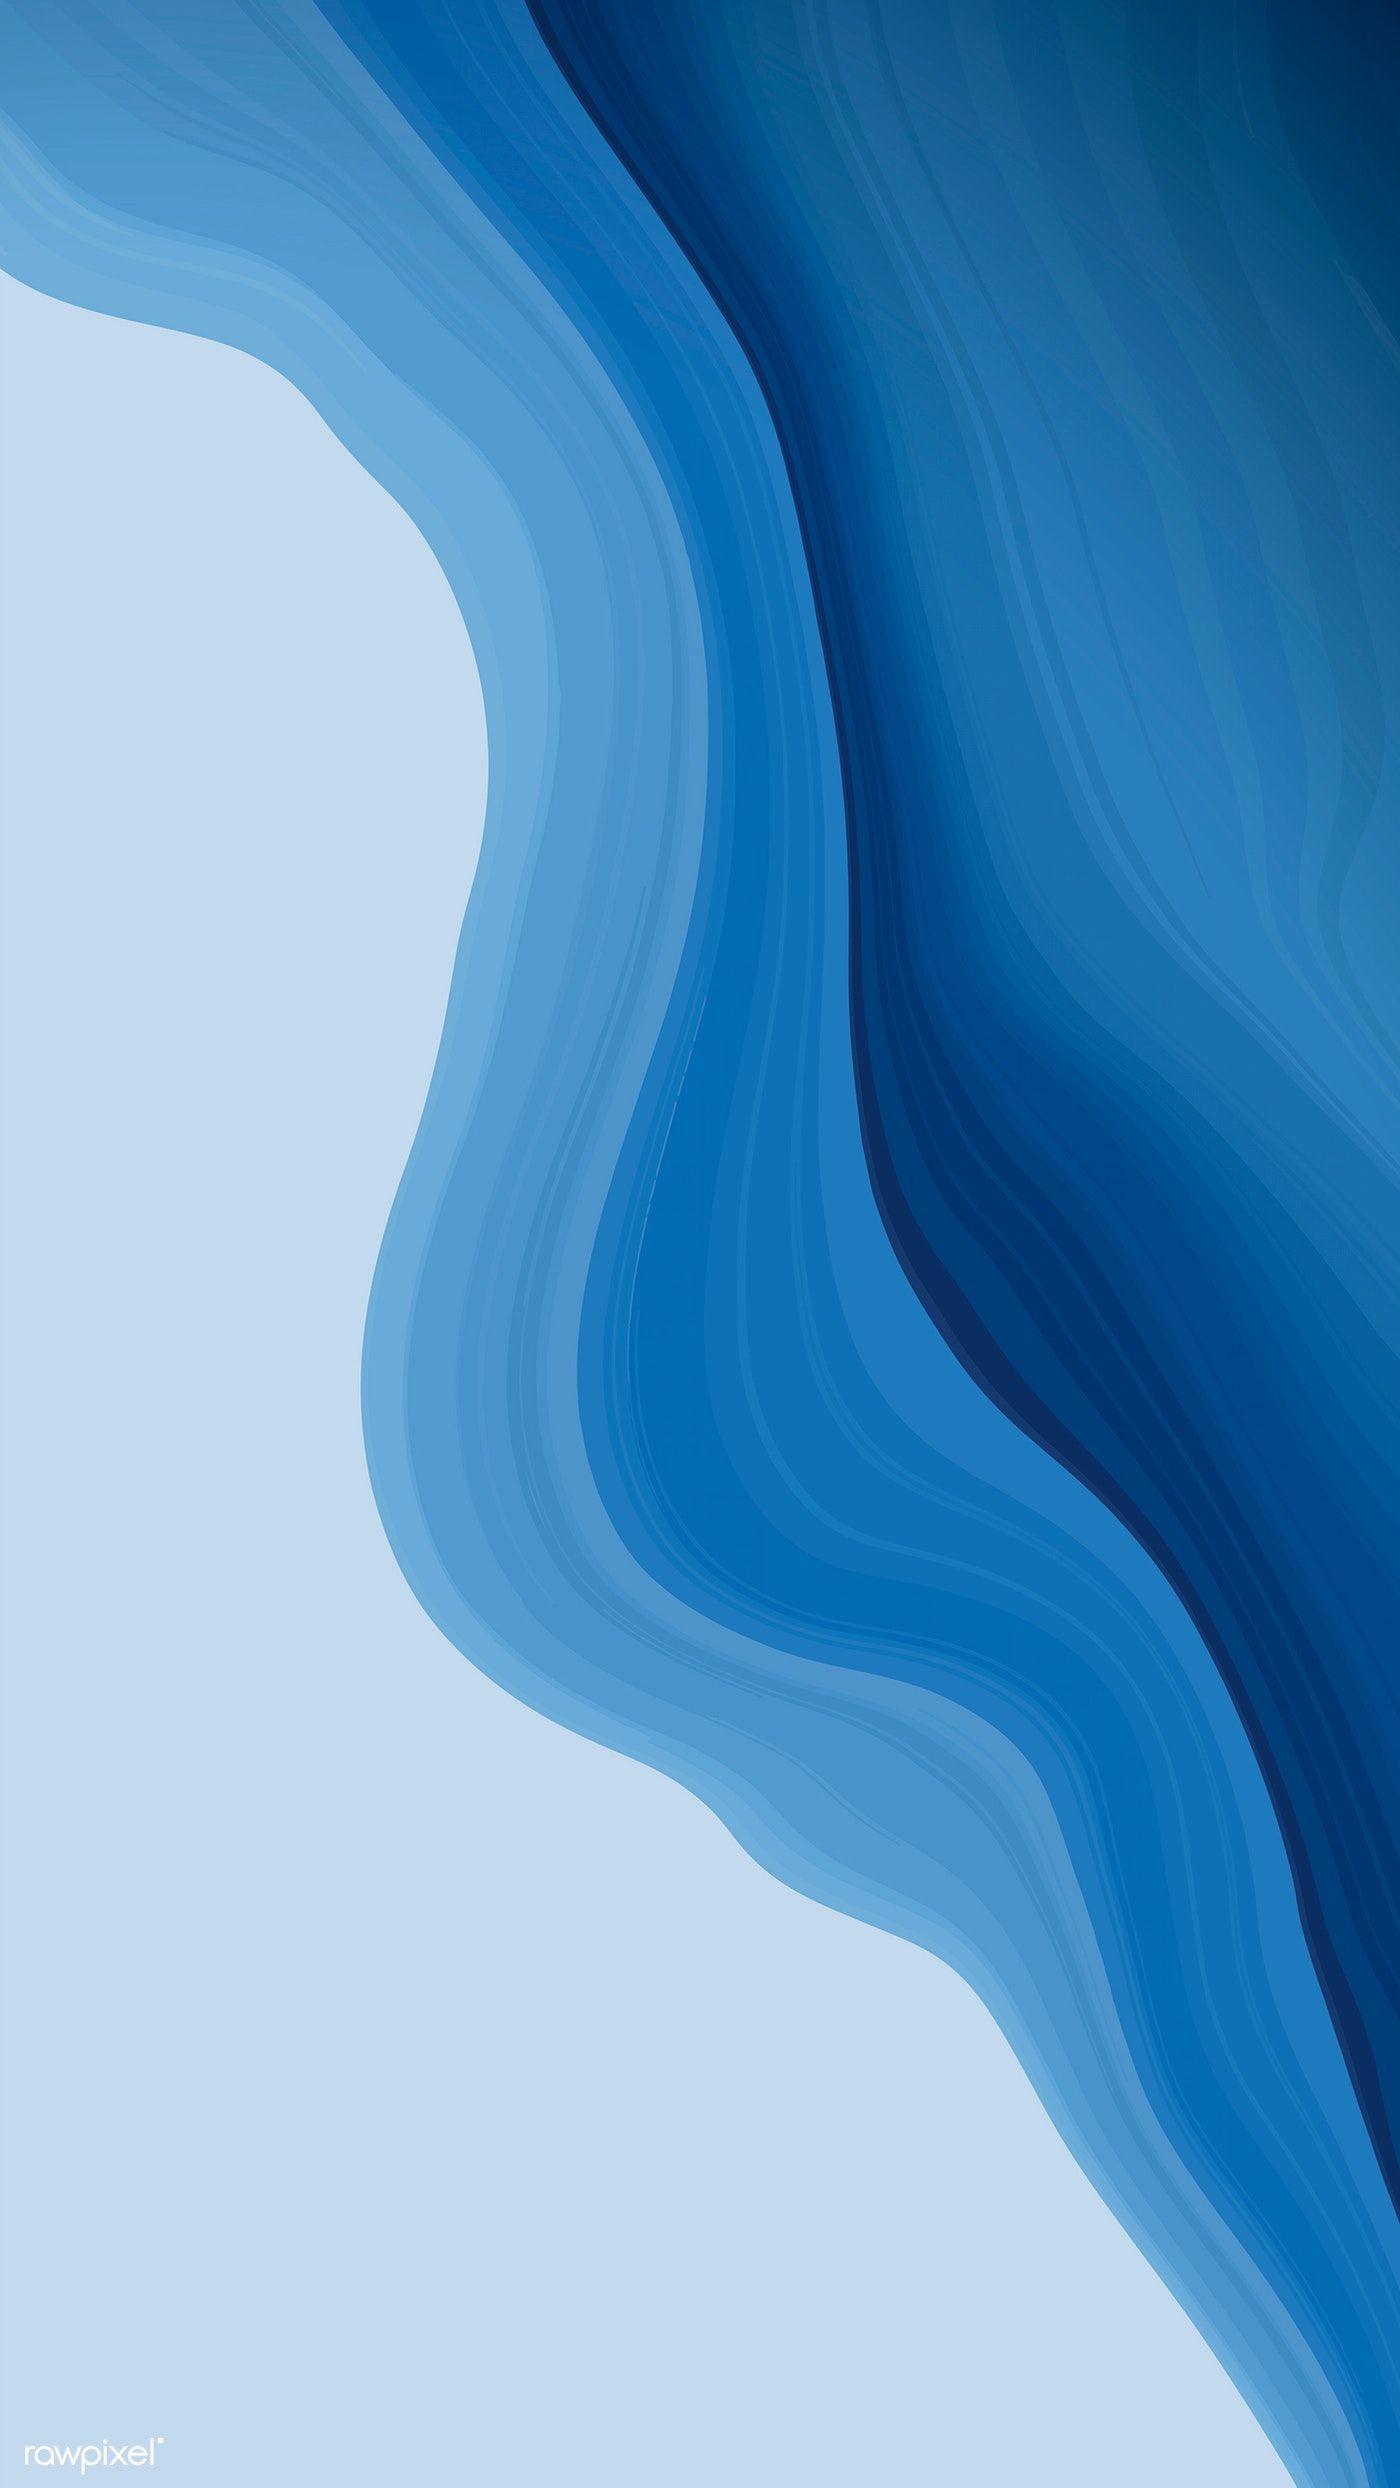 Download premium vector of Blue fluid fluid patterned mobile phone